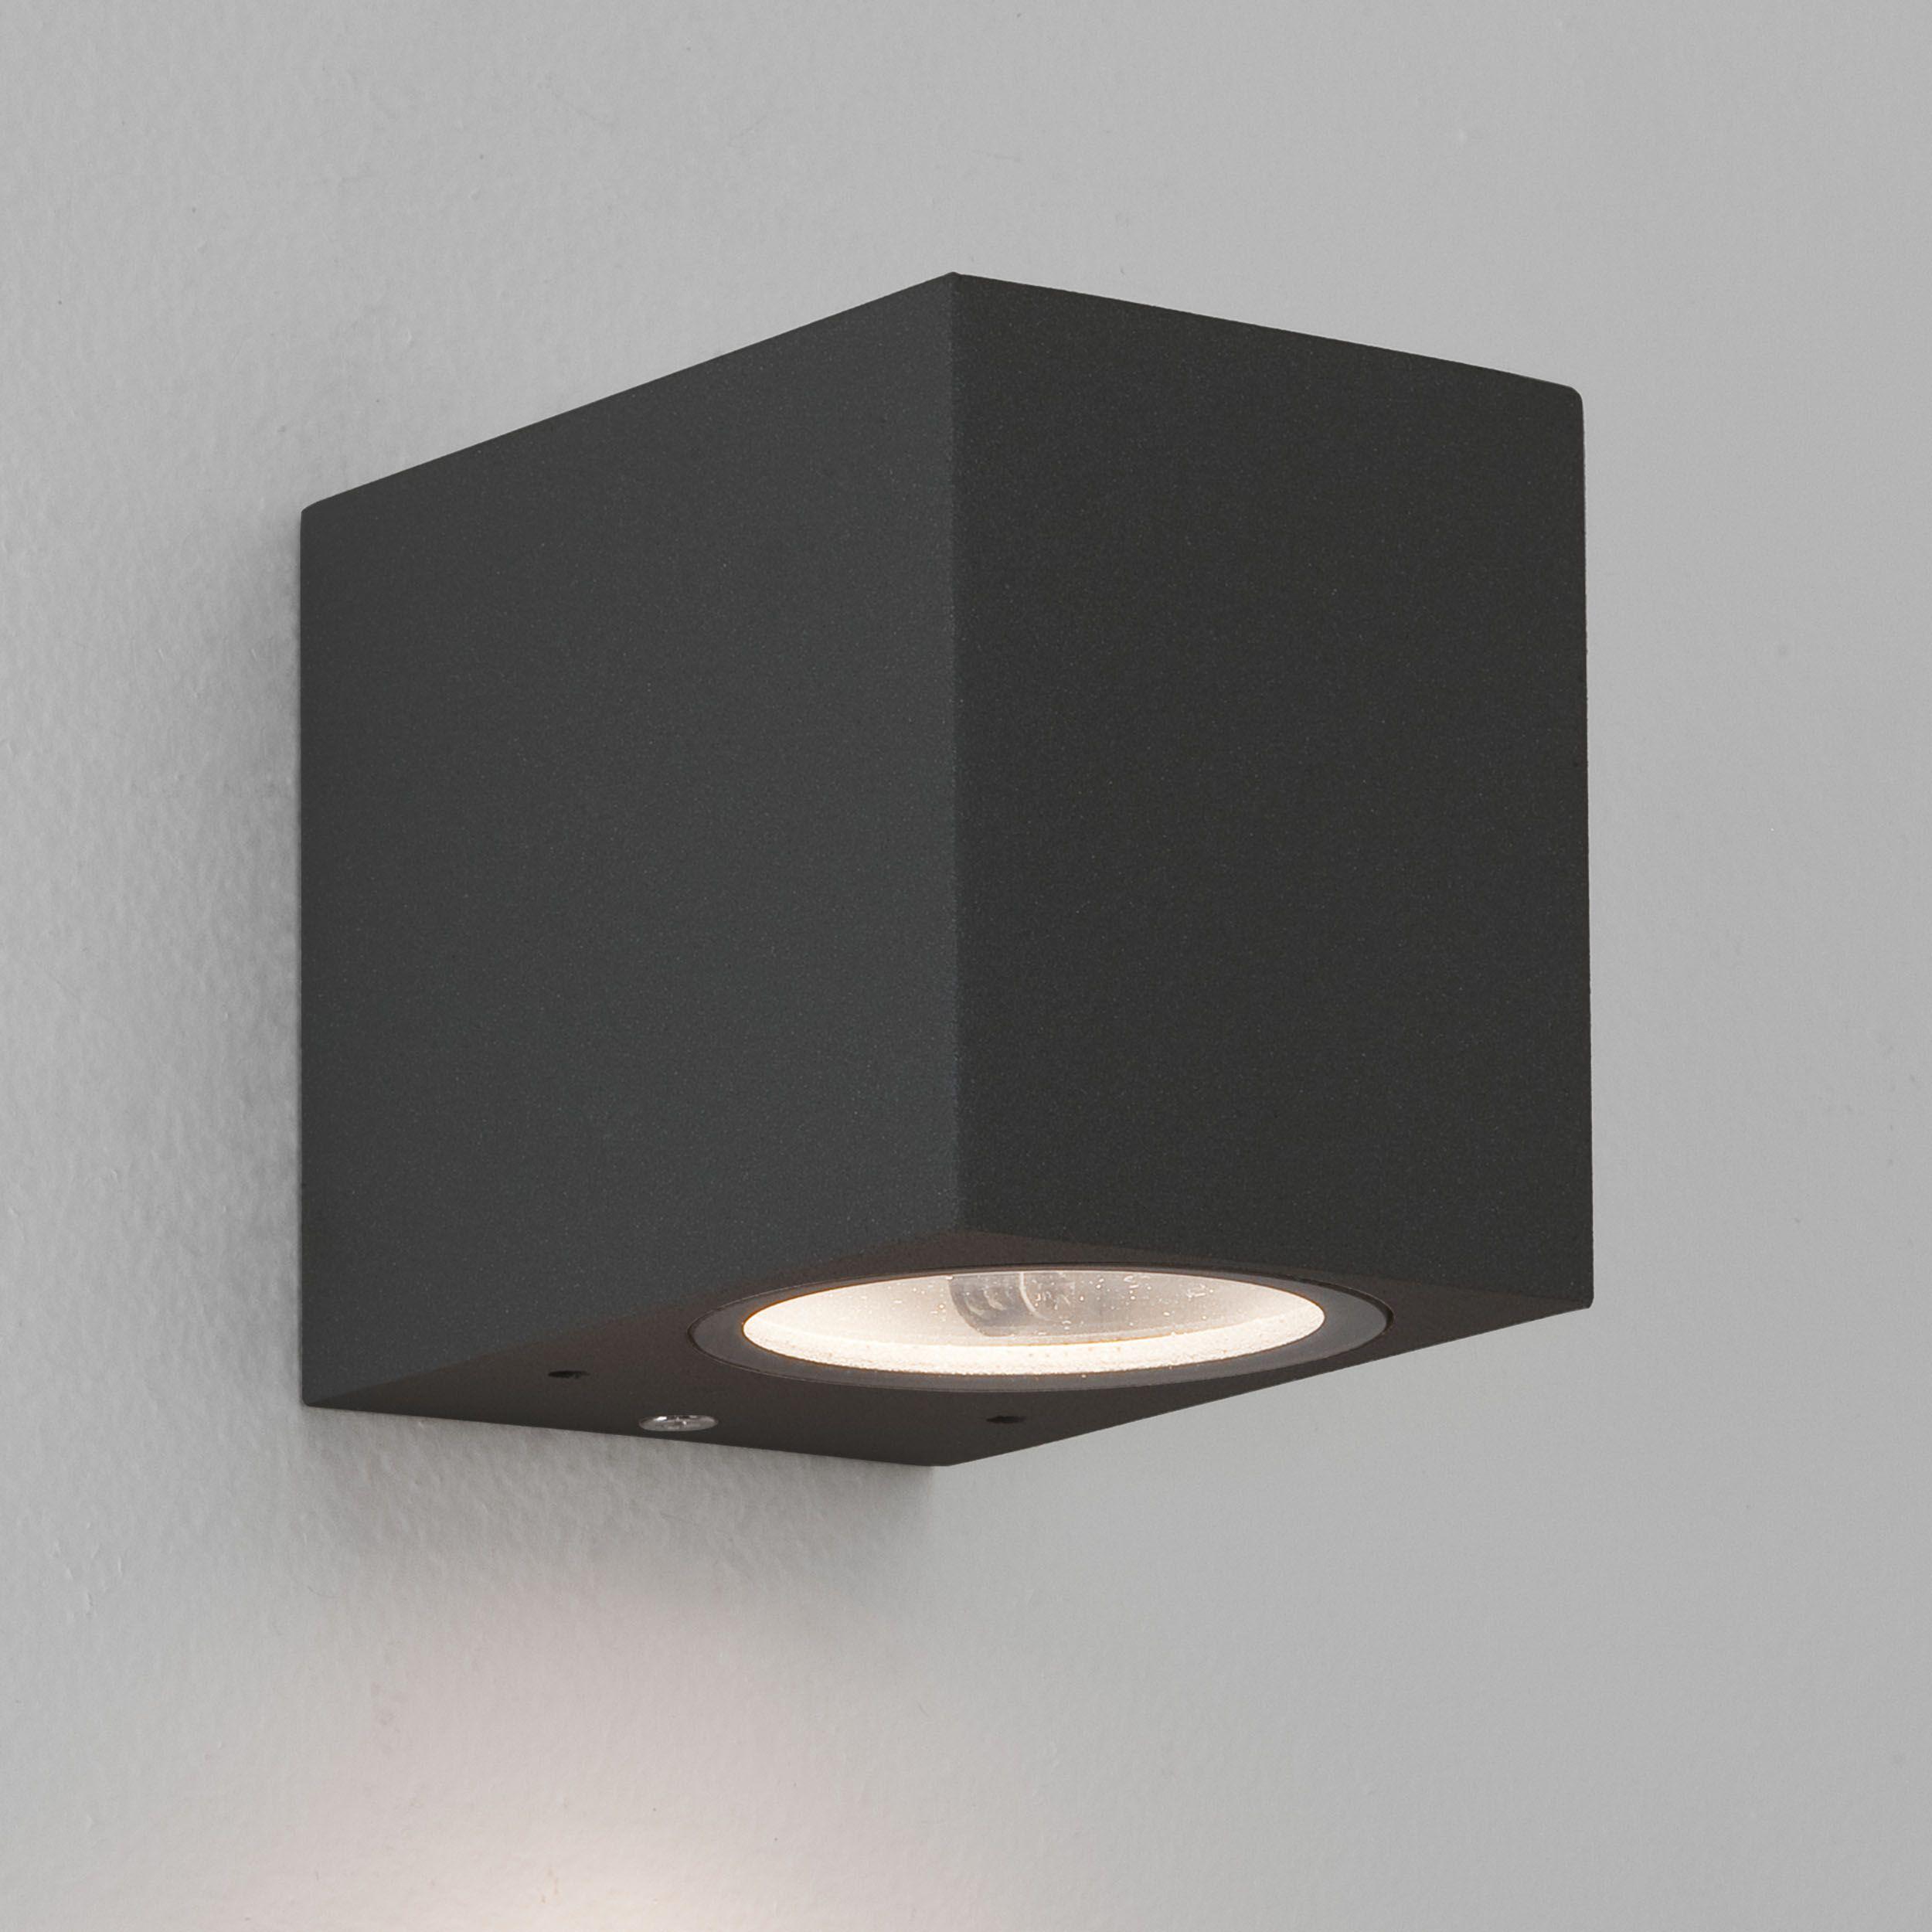 Astro chios black wall light external front pinterest